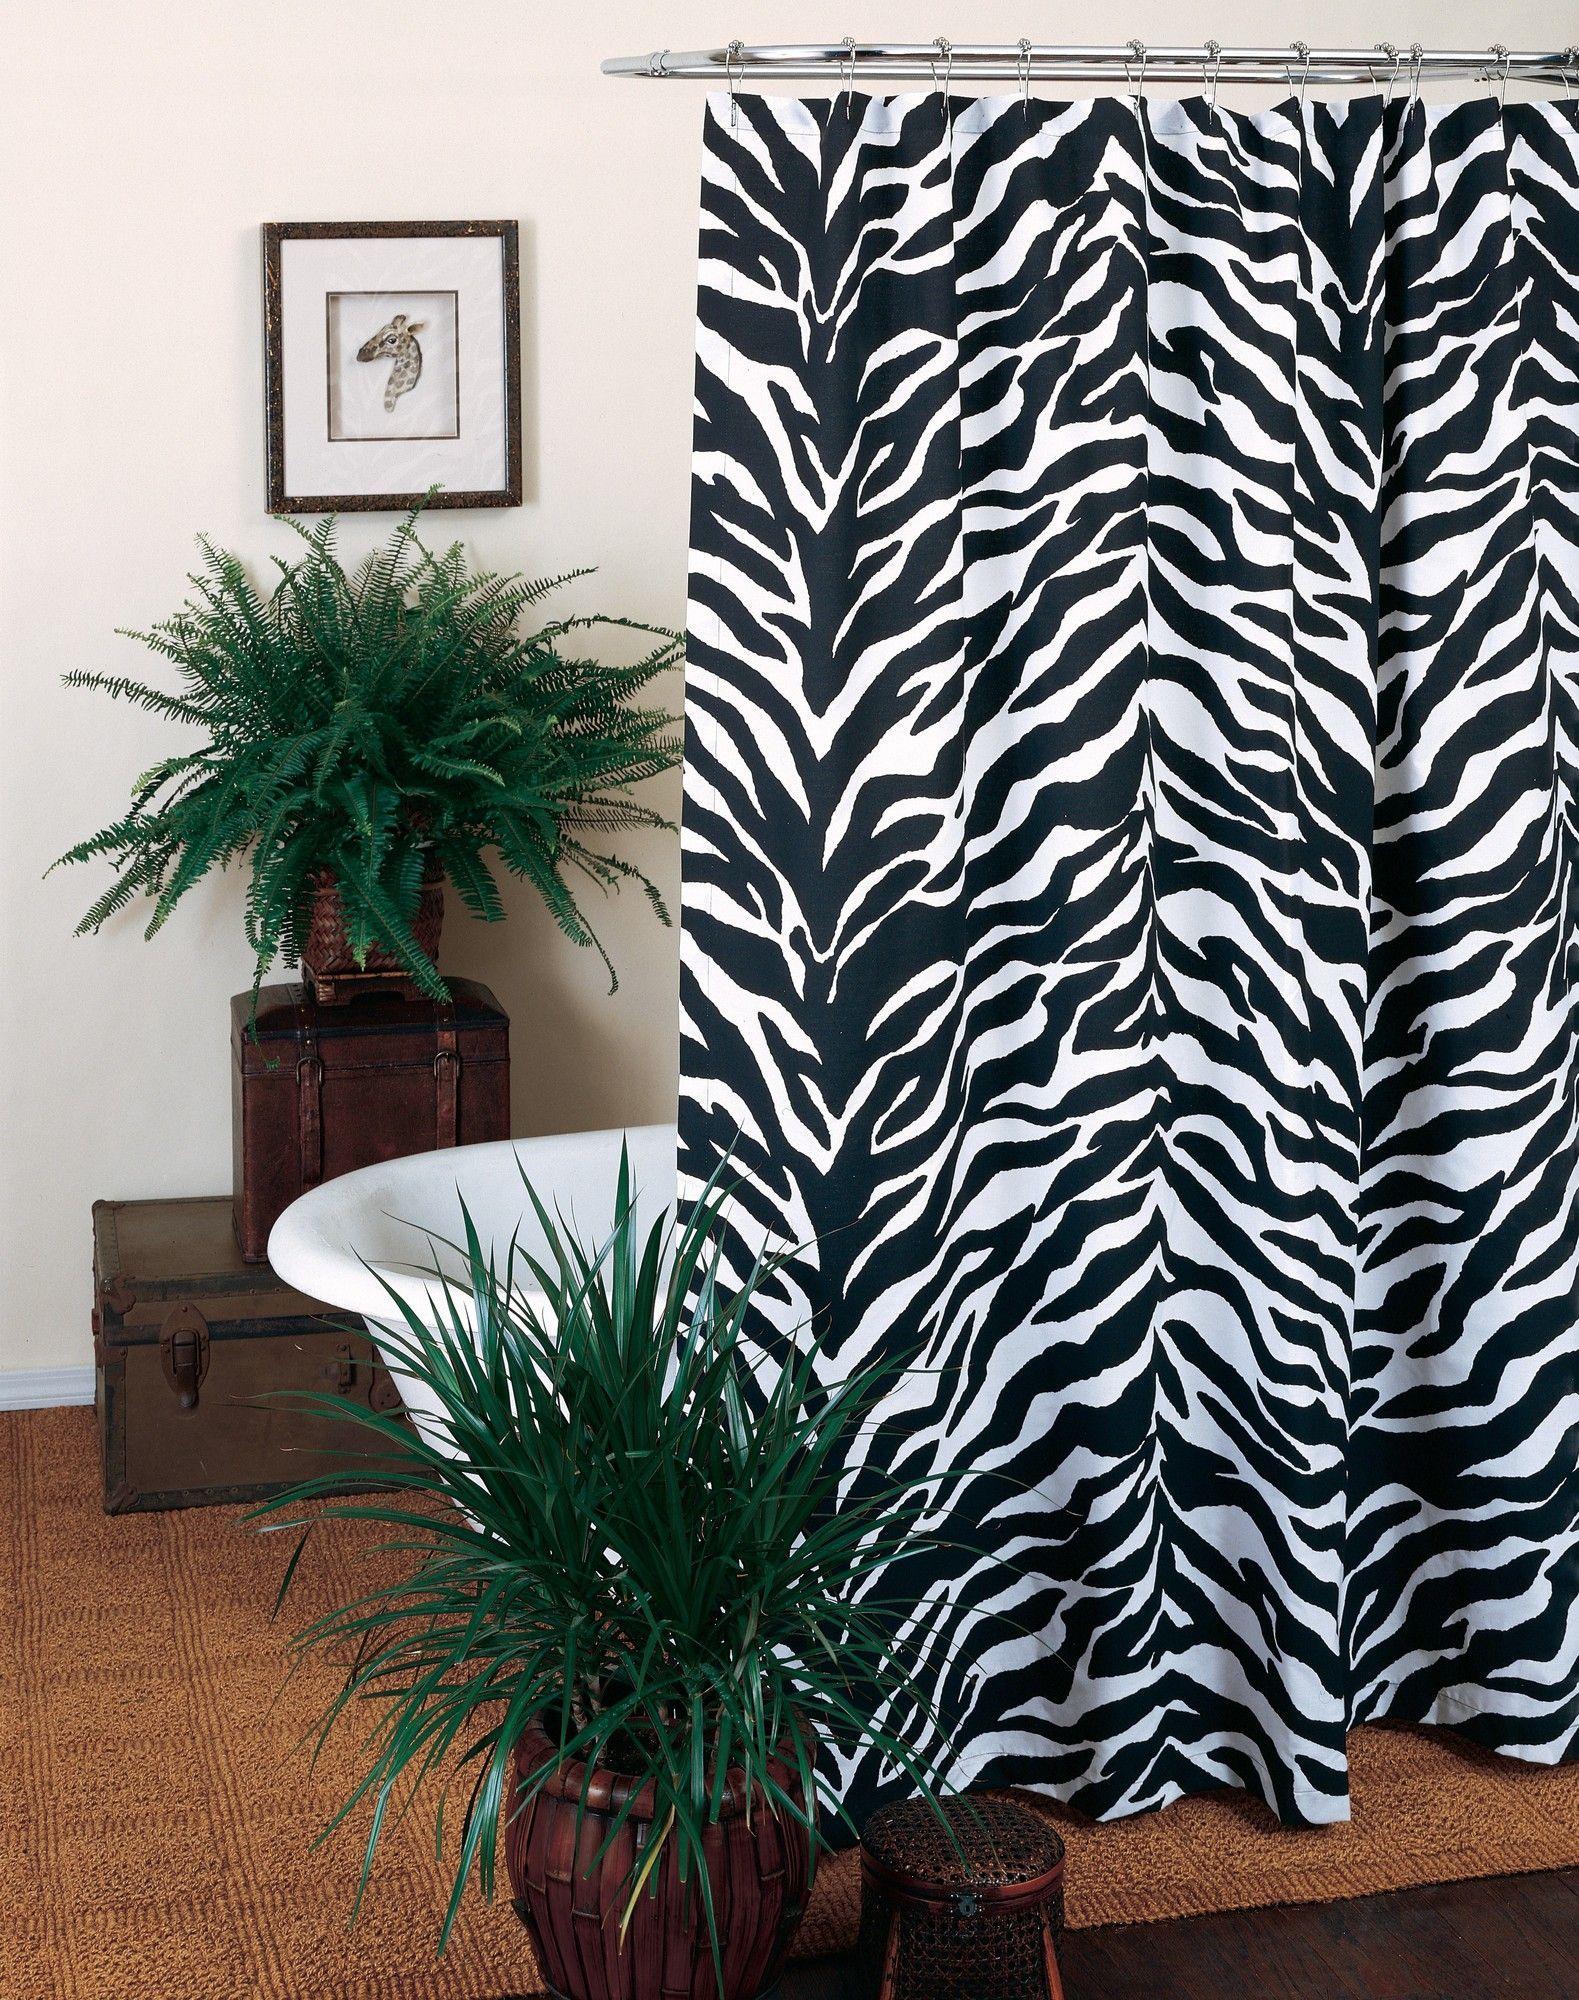 Zebra Shower Curtain Cool Shower Curtains Printed Shower